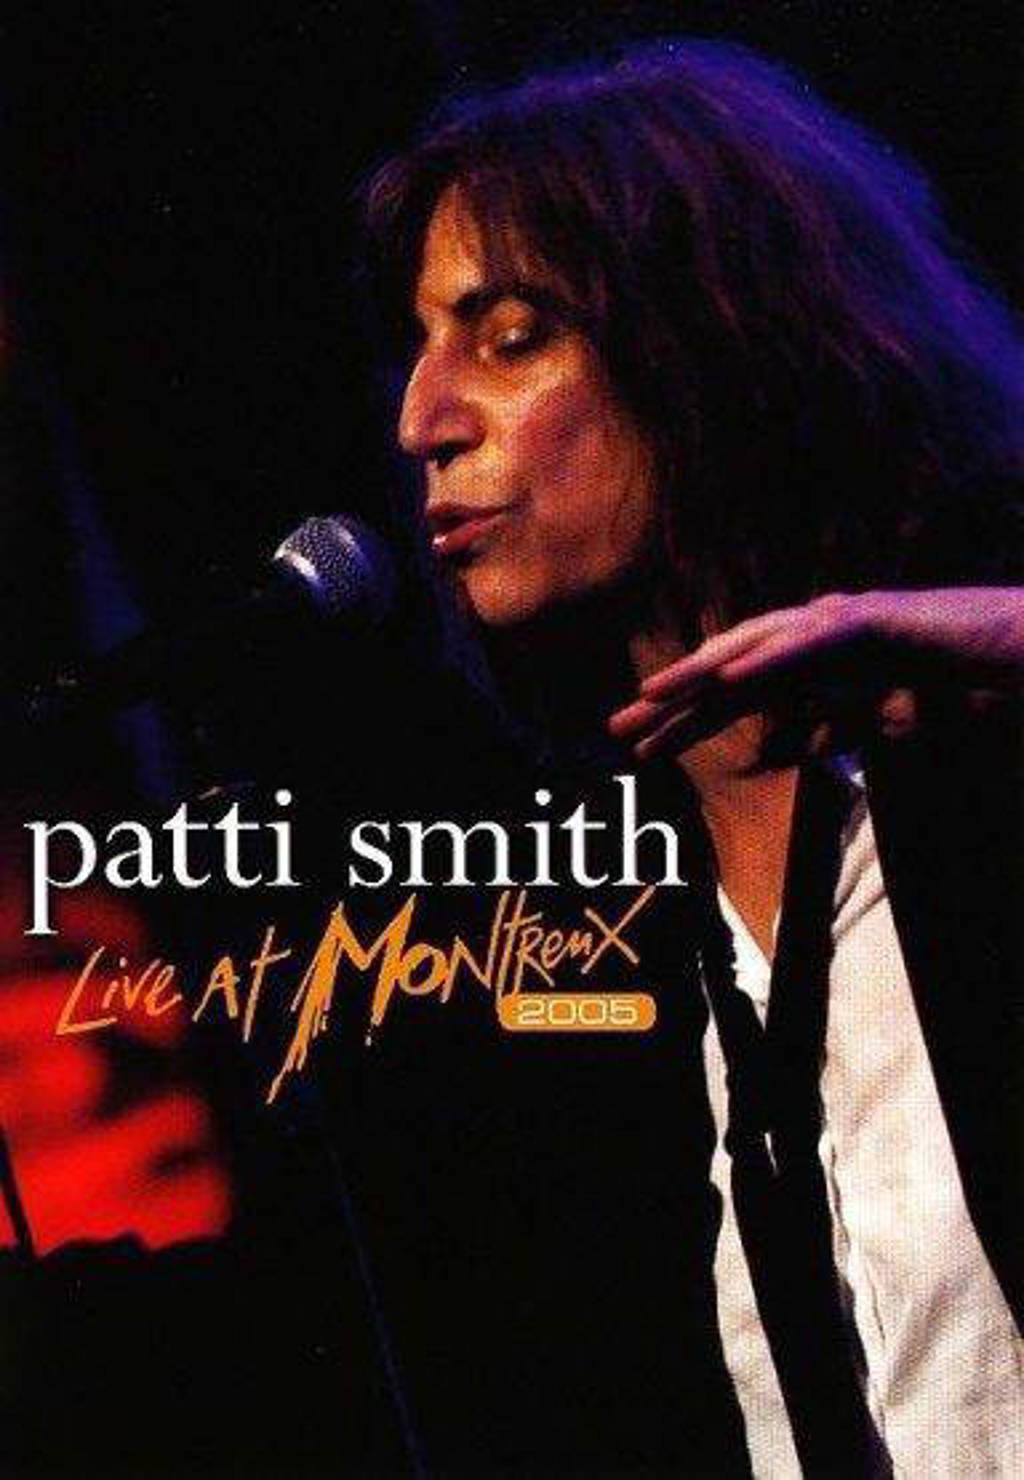 Smith Patti - Live At Montreux 2005 (DVD)